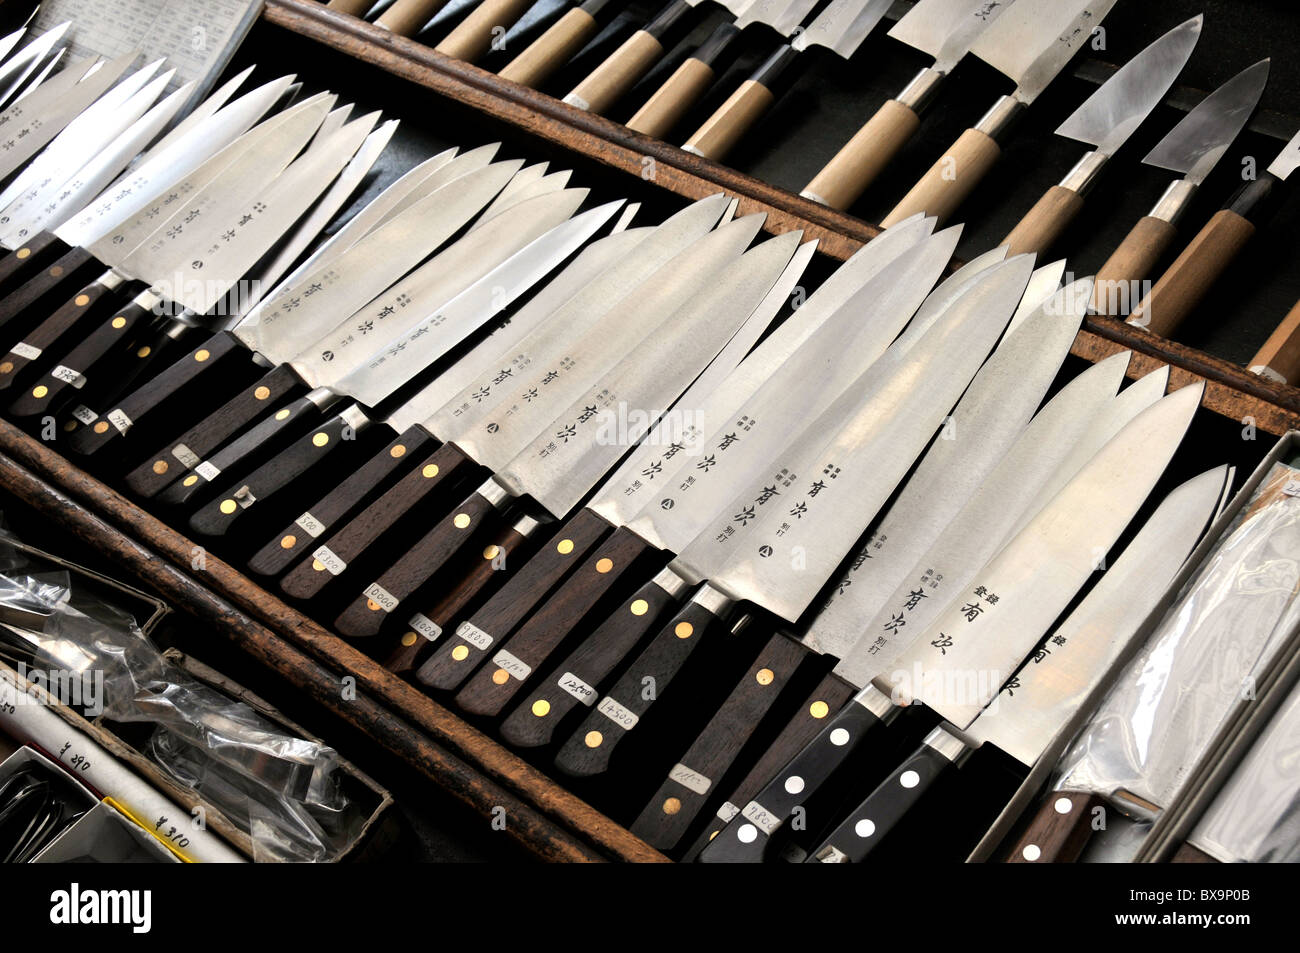 knifes on stale, Fish market, Tokyo, Japan - Stock Image